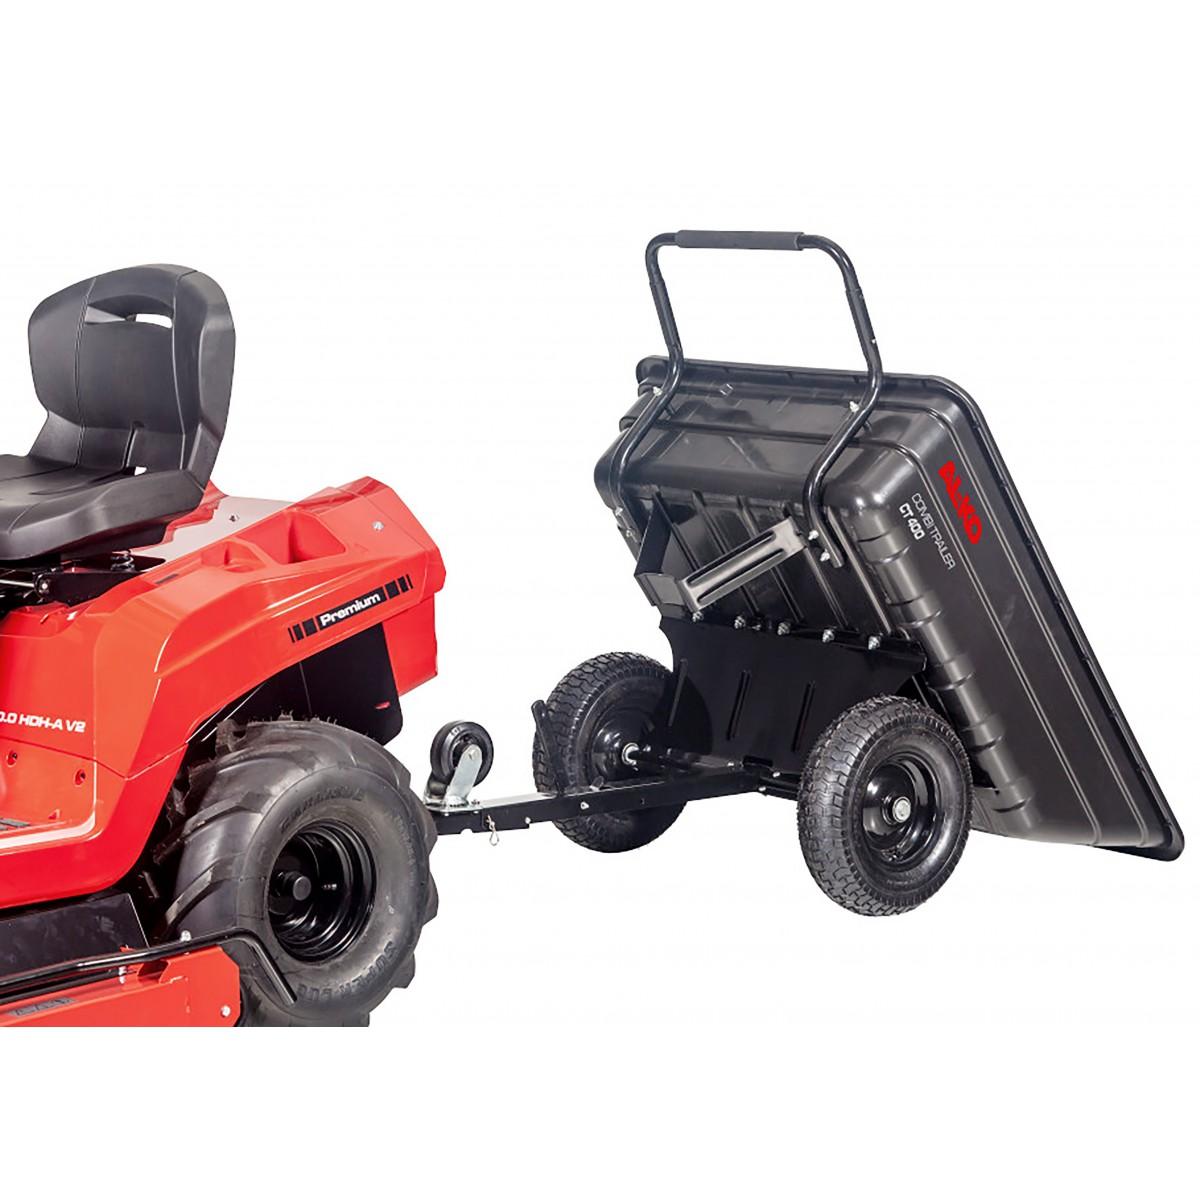 AL-KO Combi Trailer Ct 400 for the AL-KO mower tractor